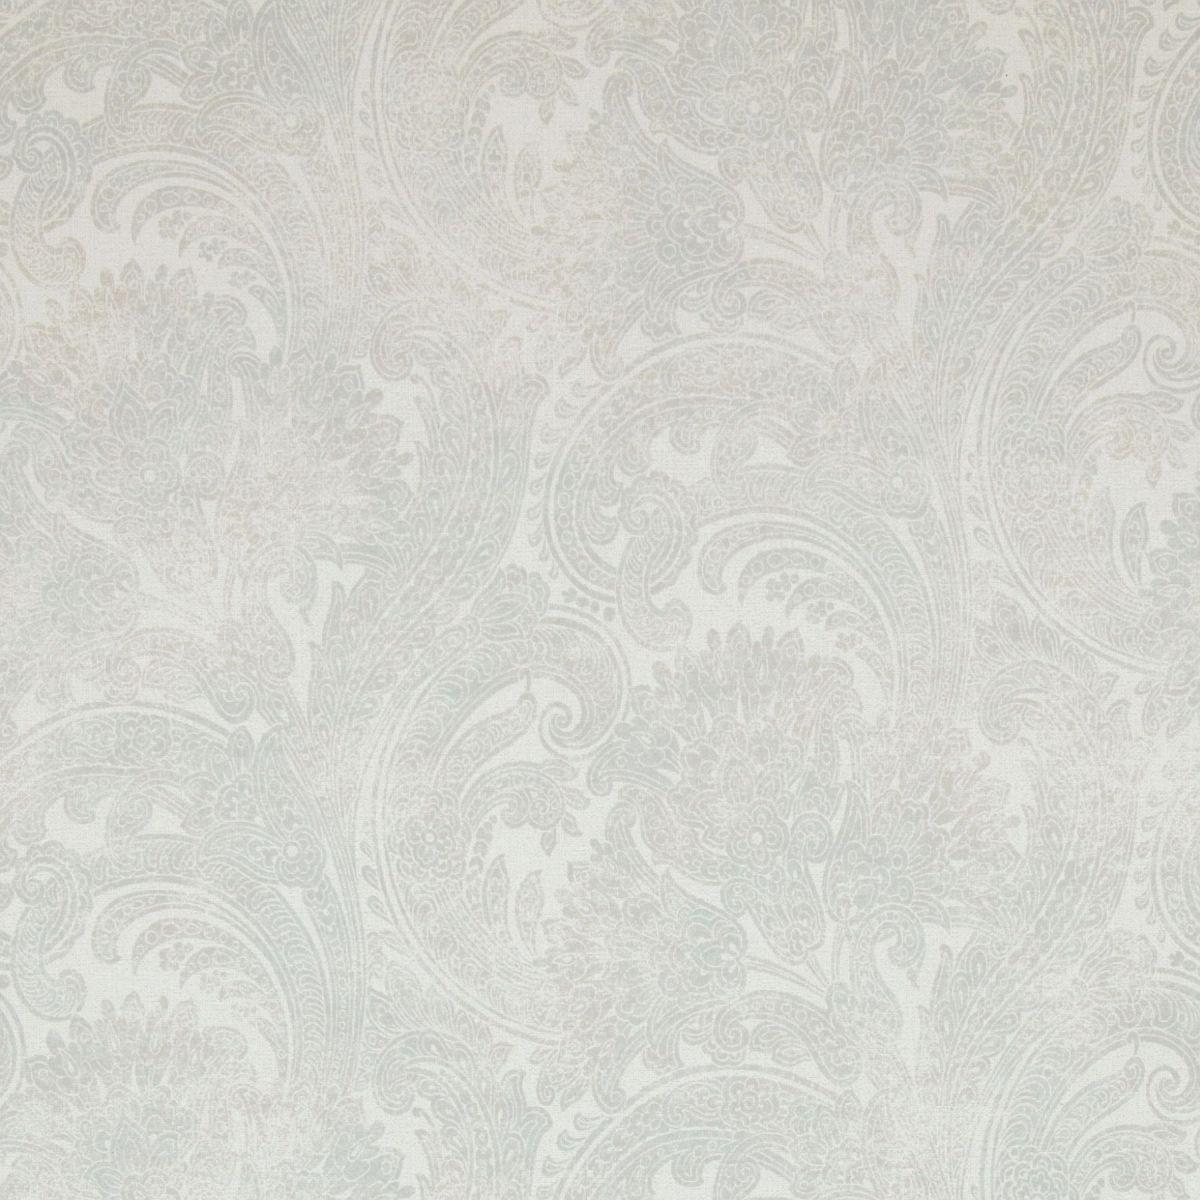 hochwertige tapeten und stoffe b n wallcoverings vliestapete riviera maison 18382 decowunder. Black Bedroom Furniture Sets. Home Design Ideas